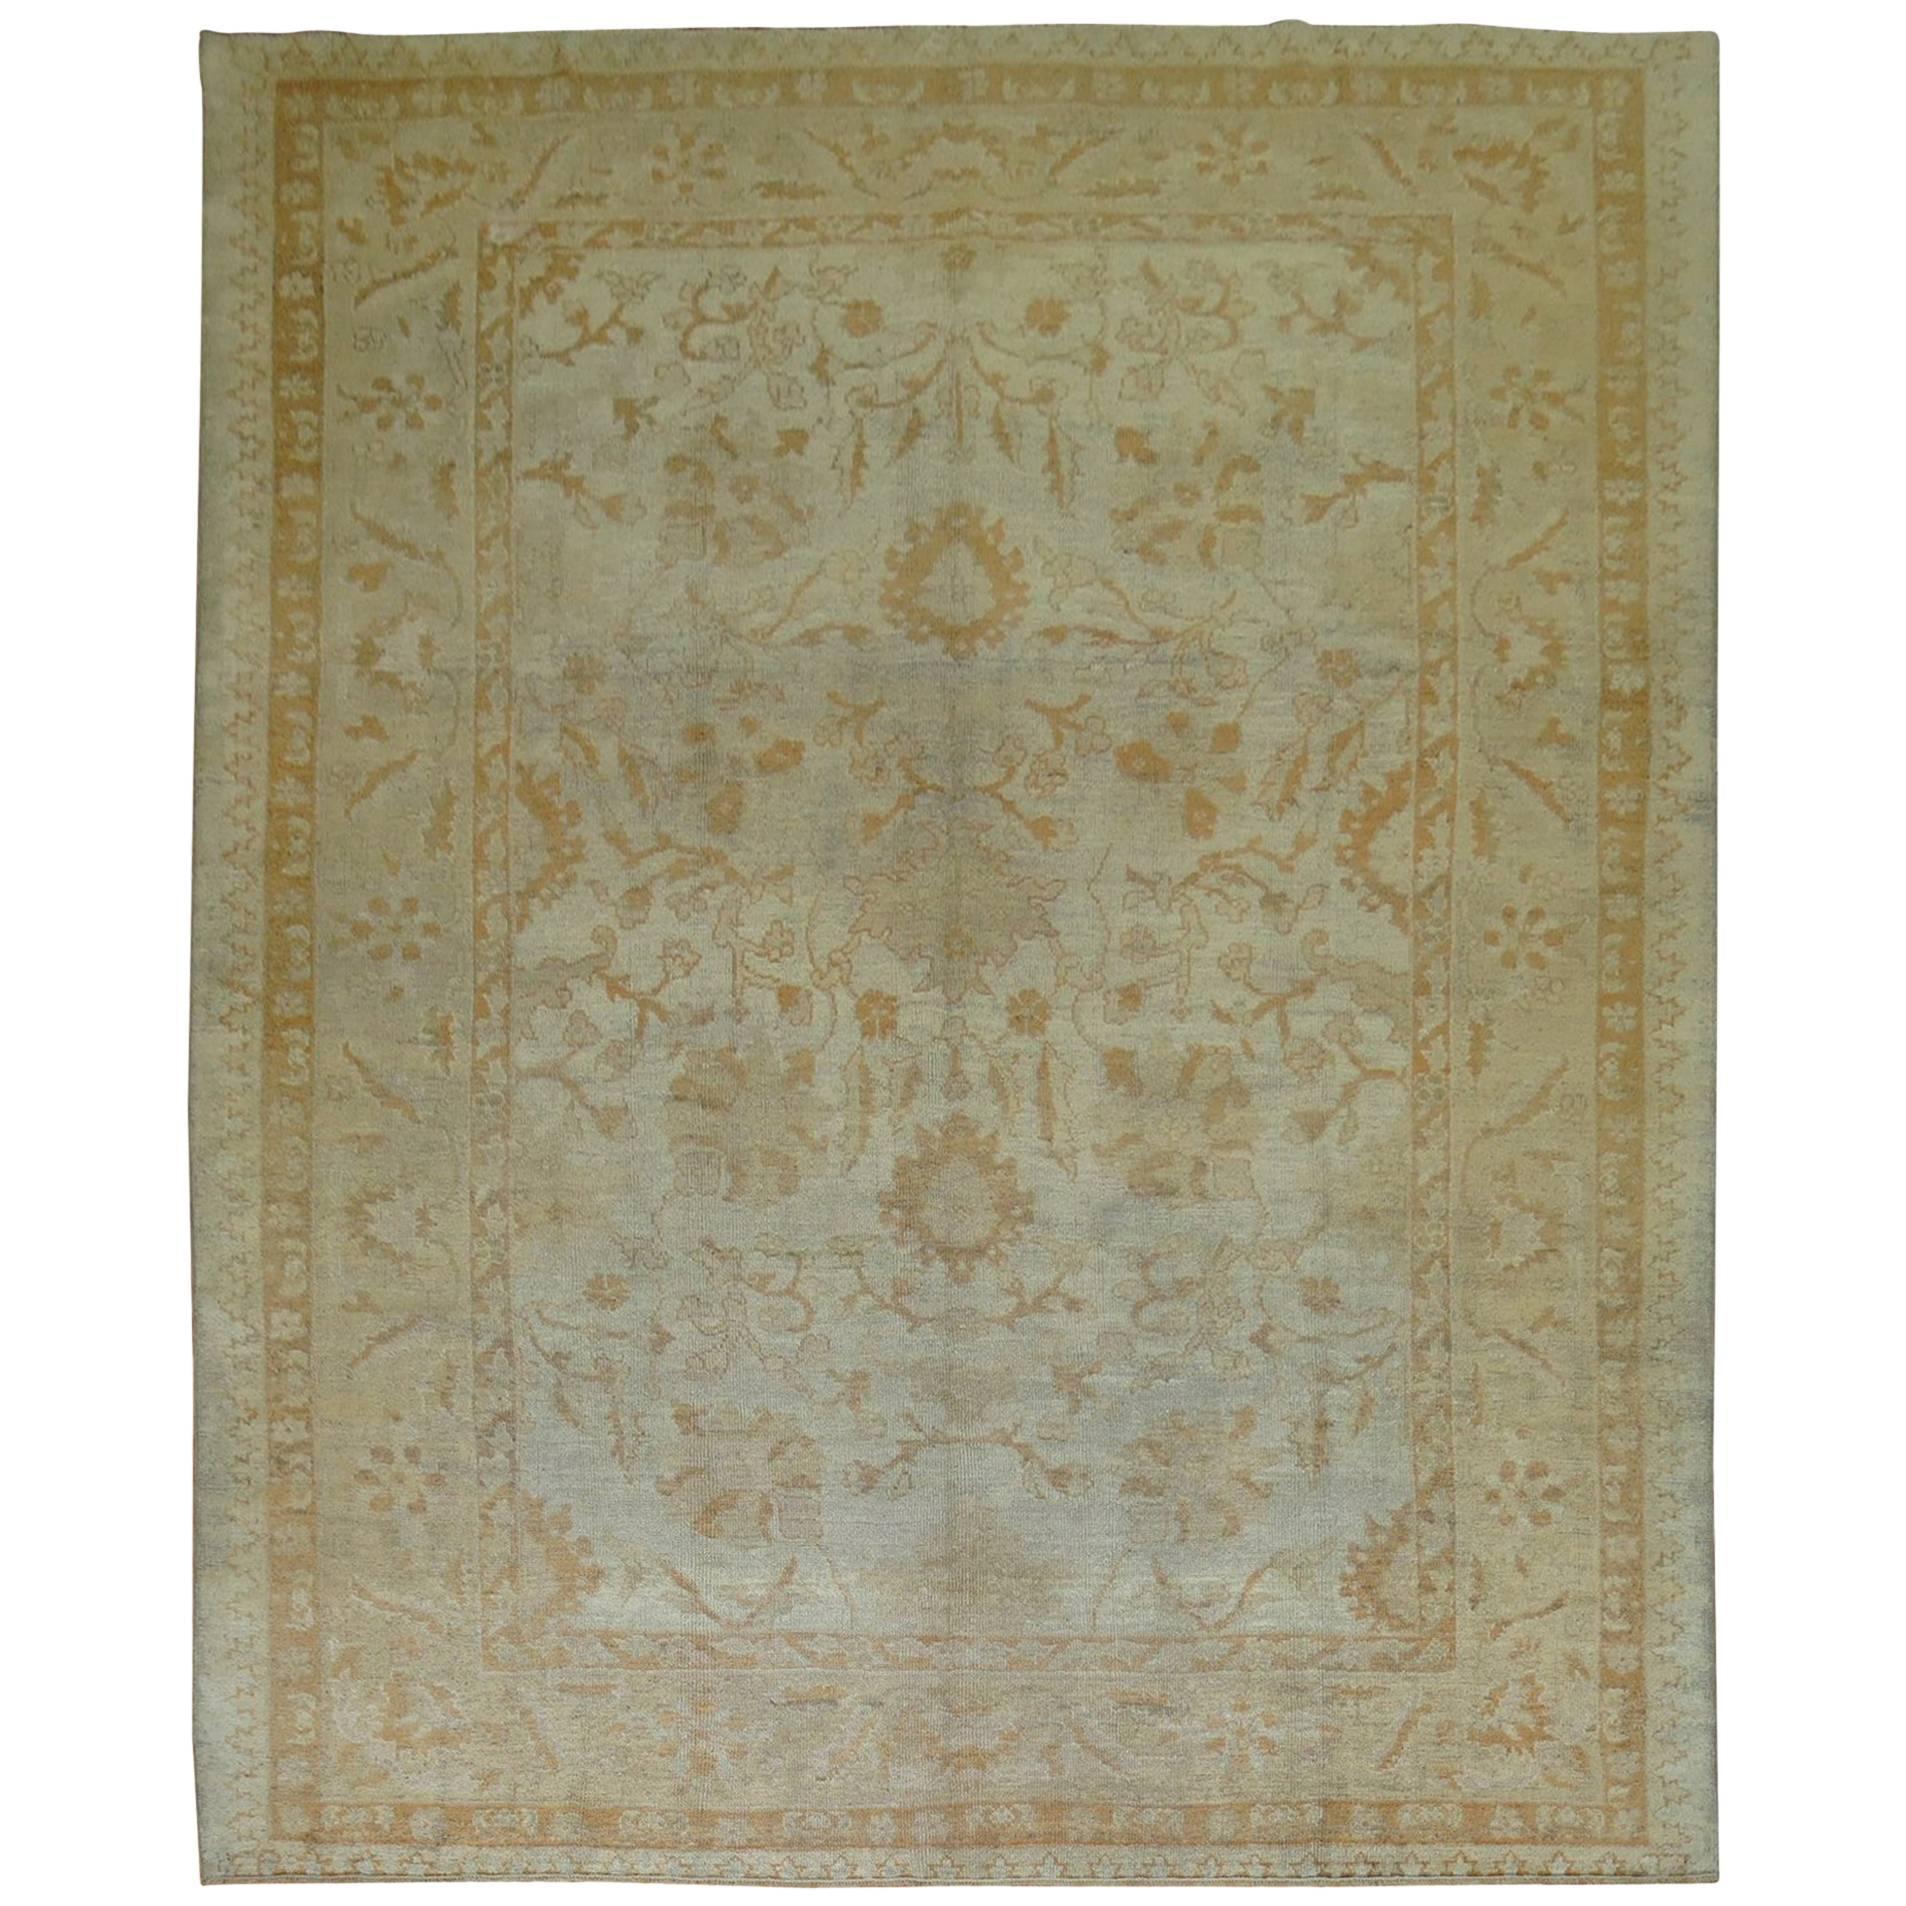 Antique Turkish Oushak Room Size Carpet